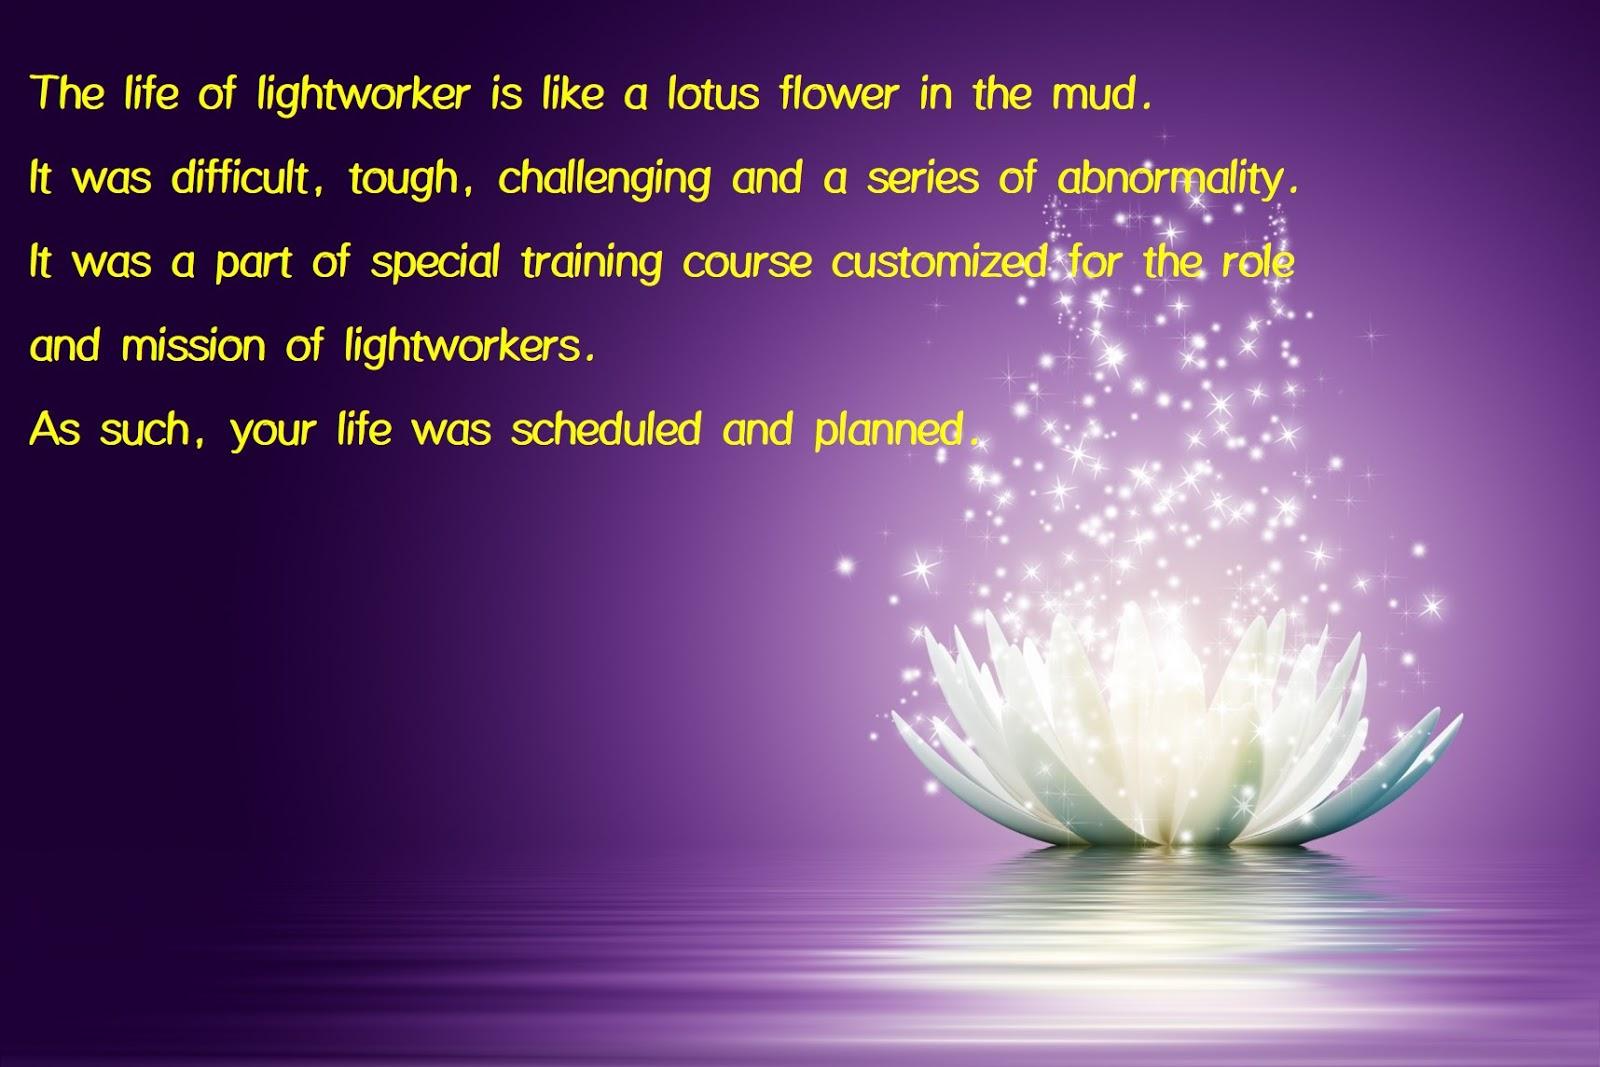 The tragic destiny of lightworkers 9 : Fierce life program